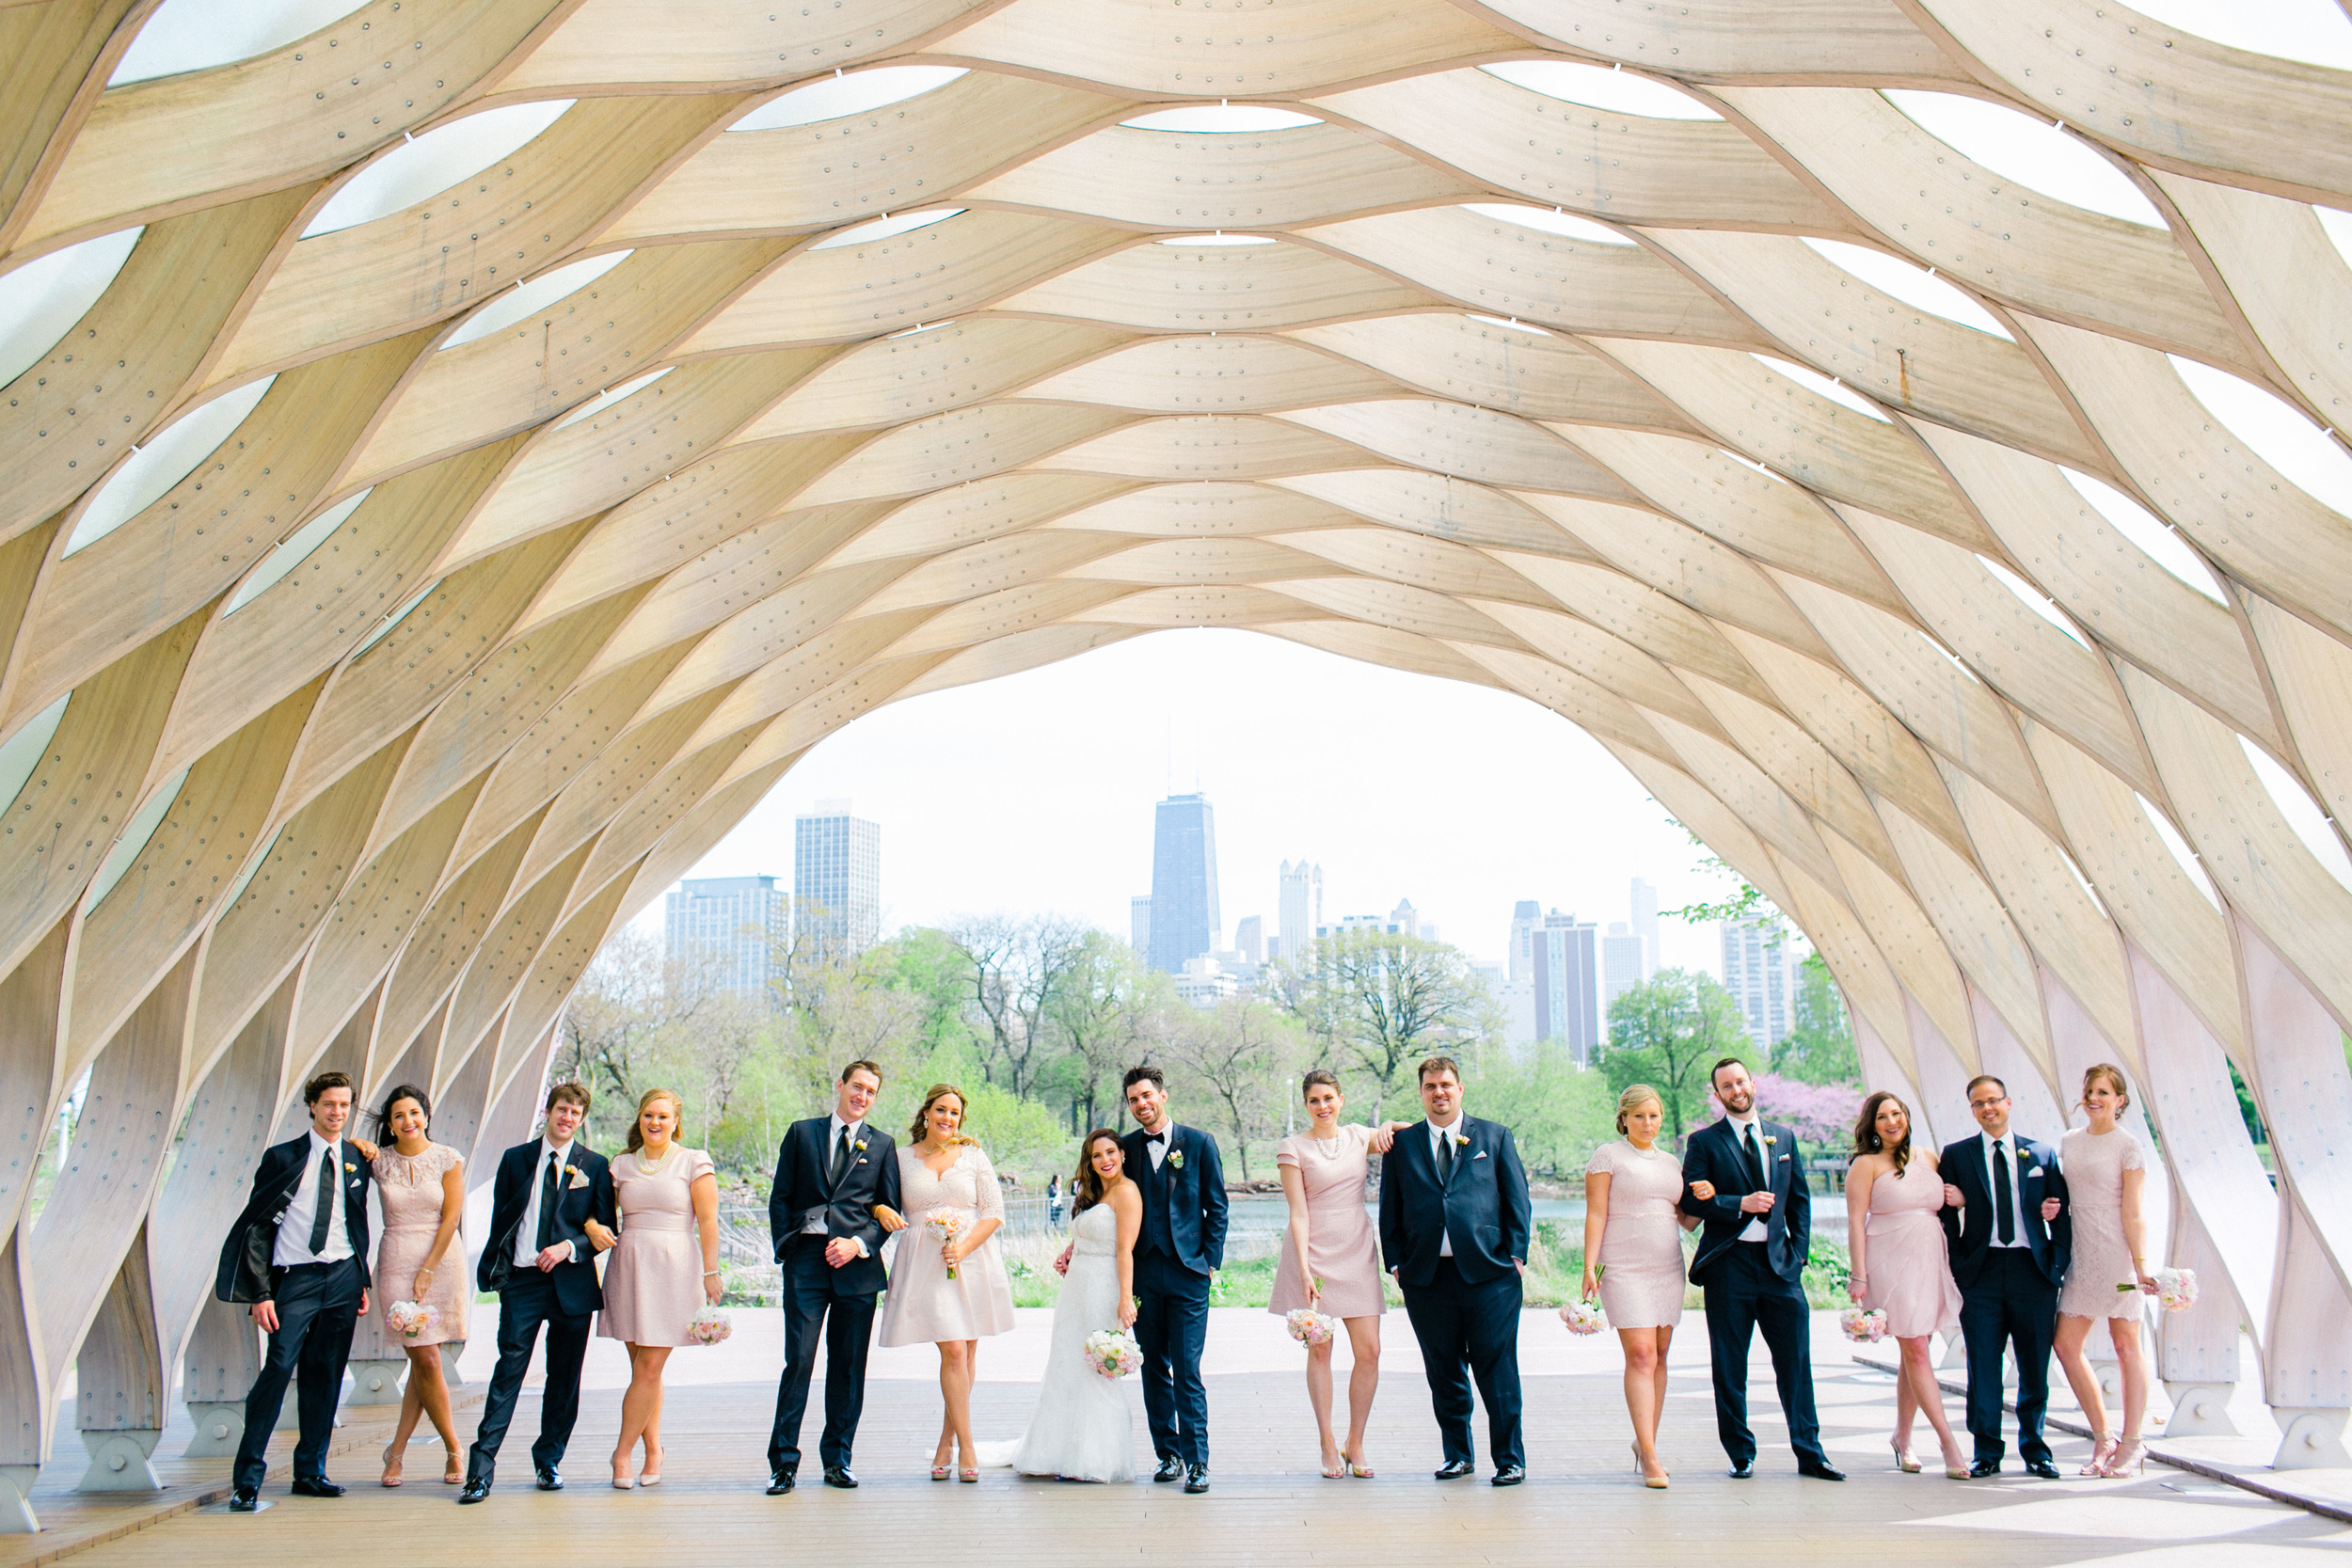 mayden_photography_weddings-66.jpg